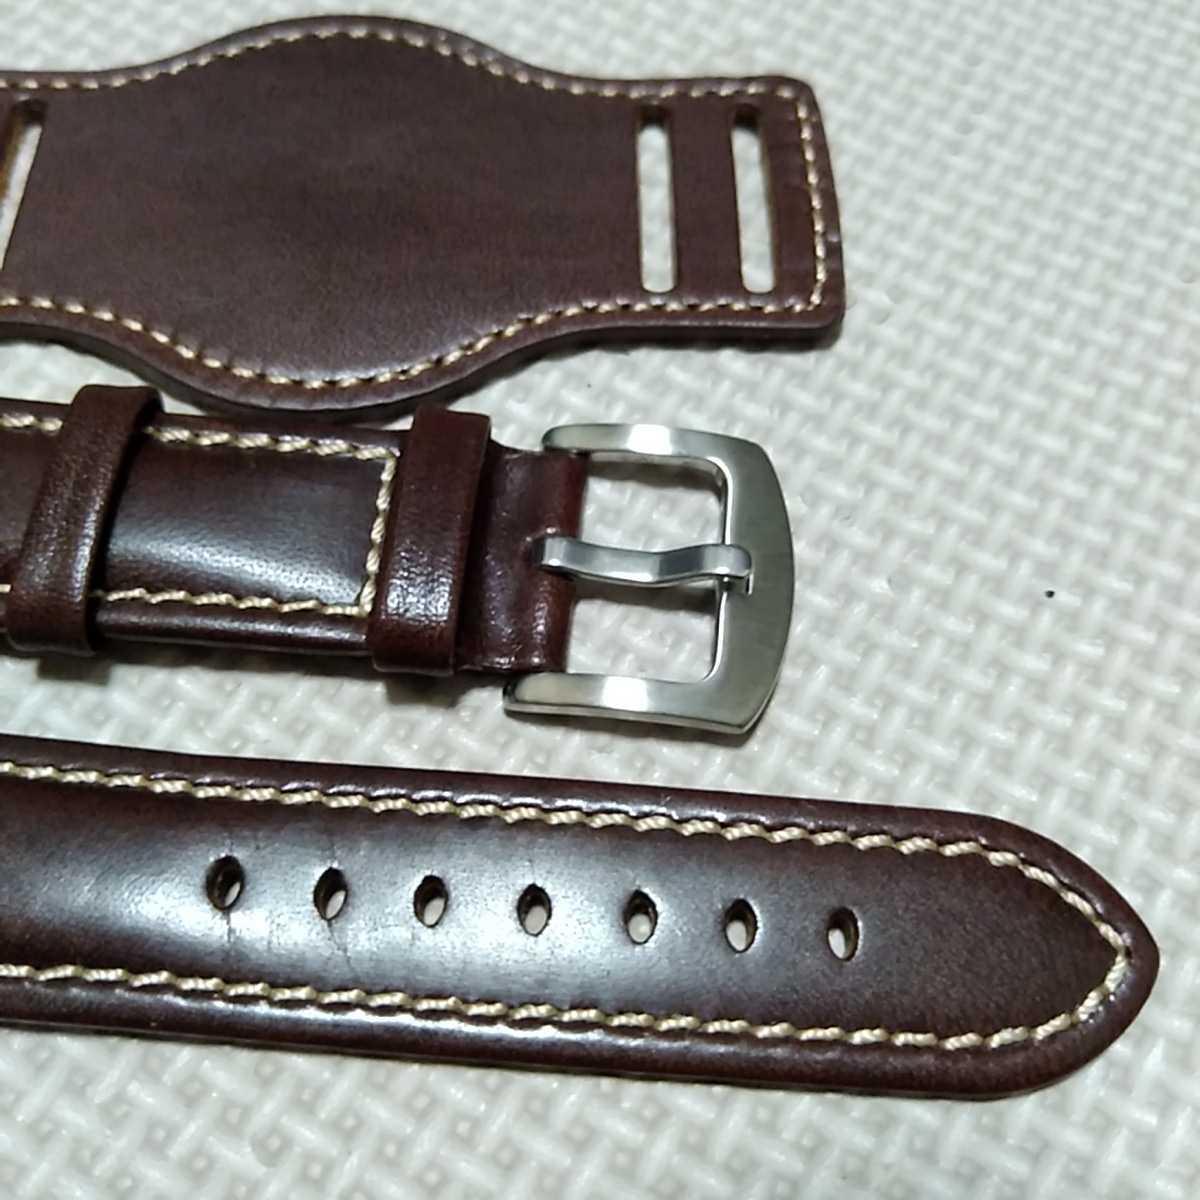 No50 ブンド BUND 本革レザーベルト 腕時計ベルト 交換用ストラップ ブラウン 22mm 未使用 高品質 ドイツパイロット 空軍_画像3